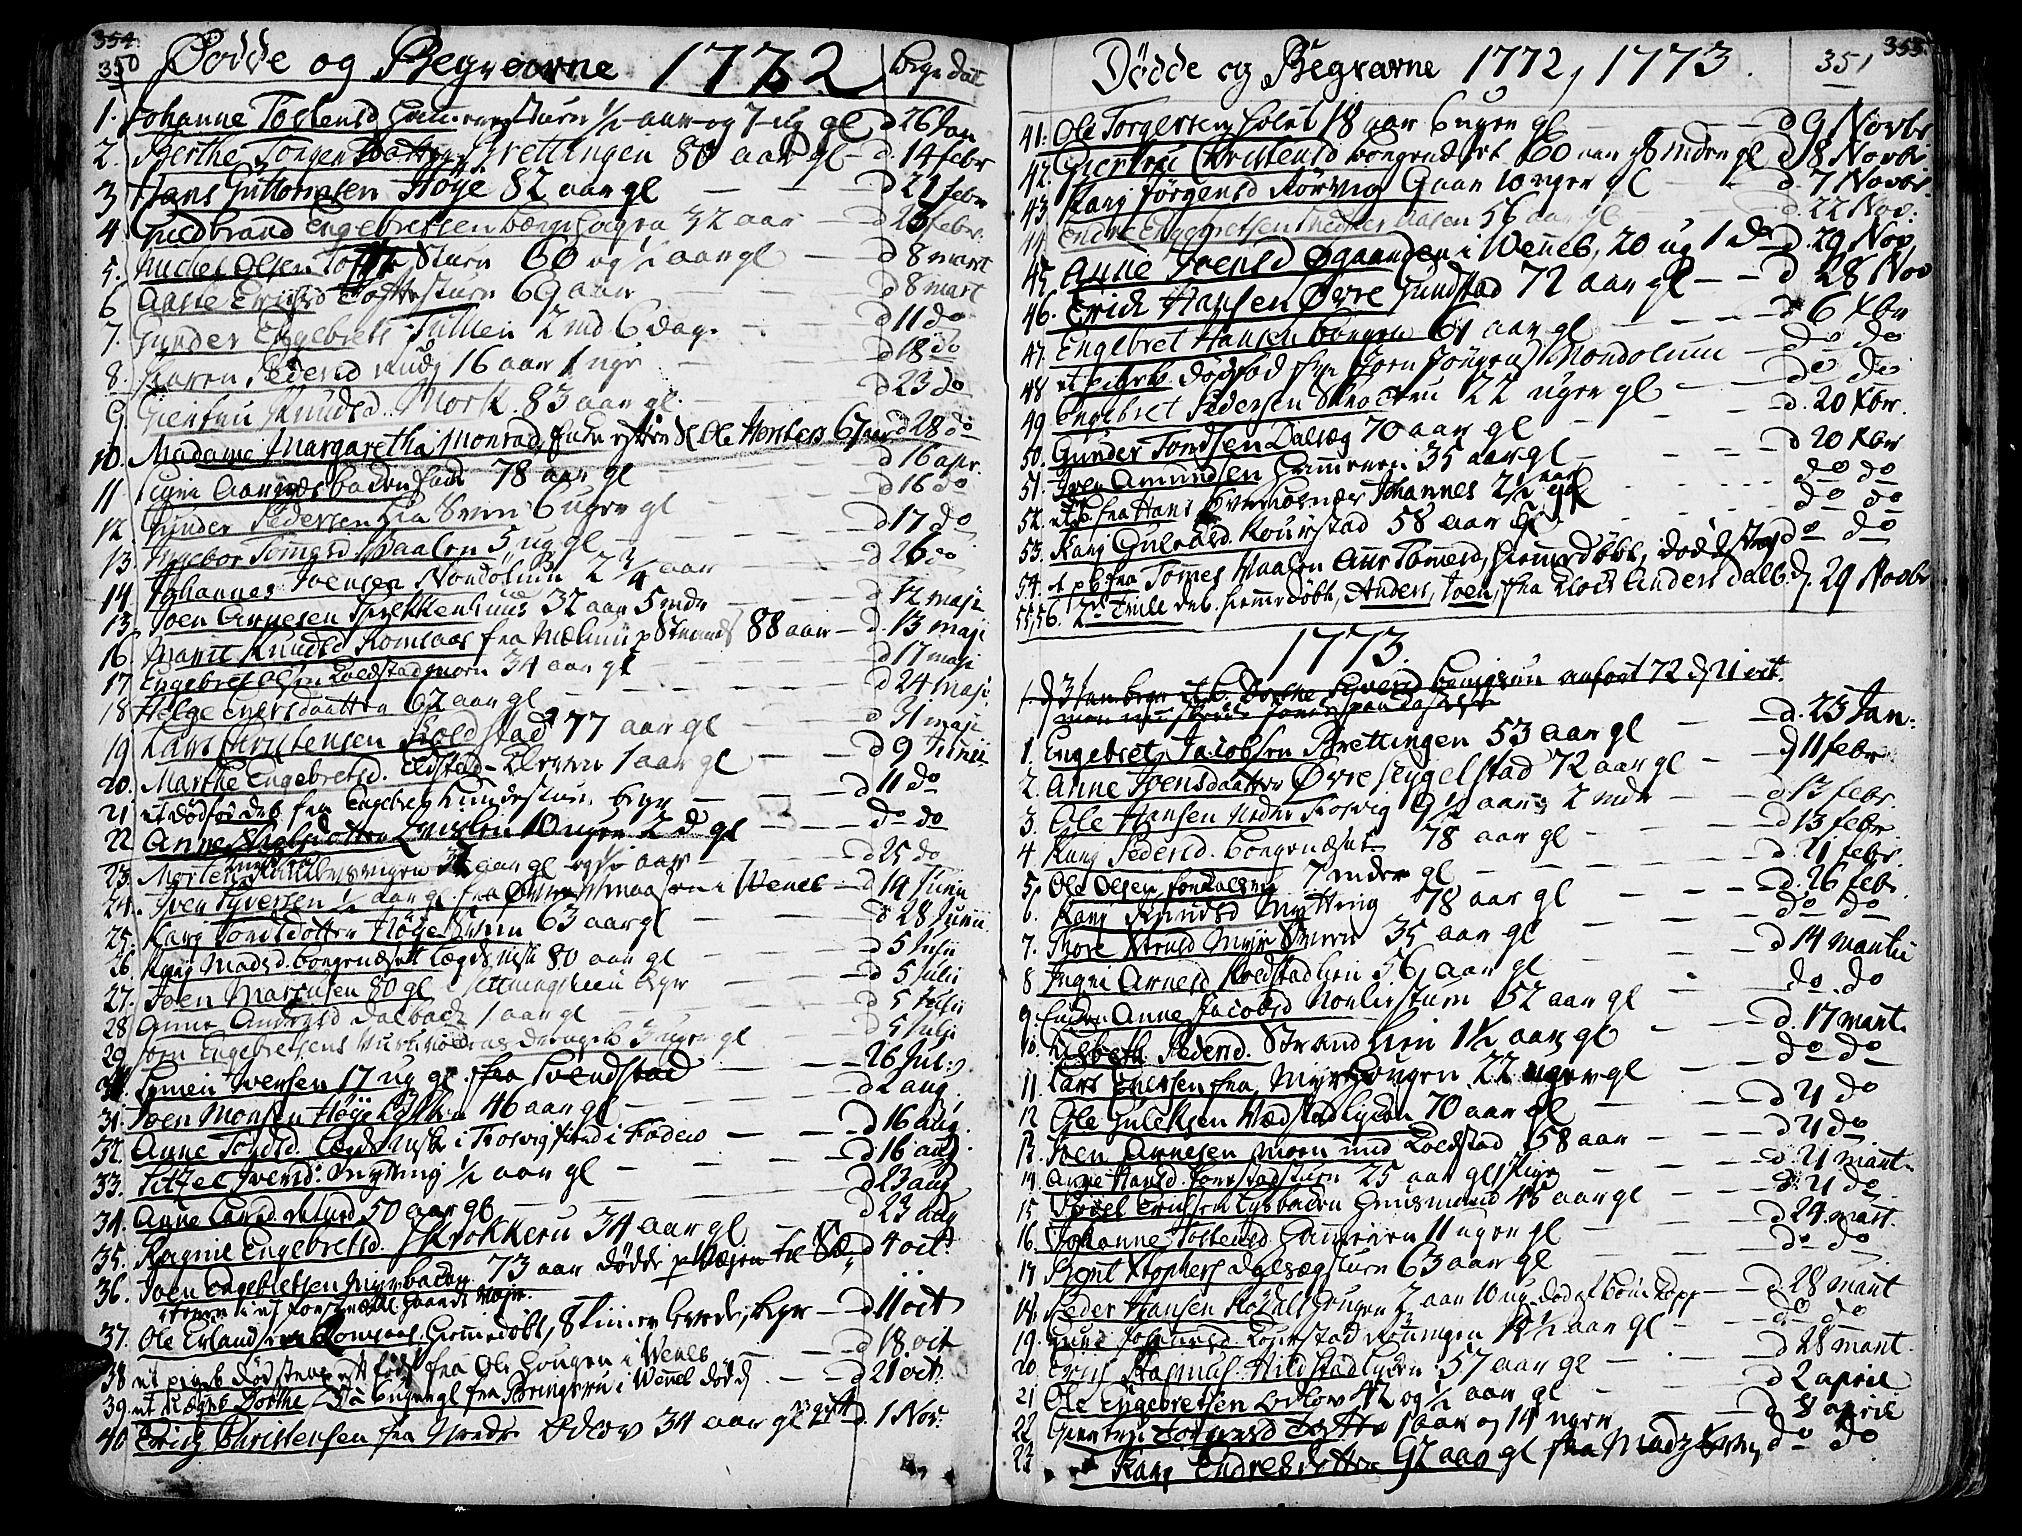 SAH, Ringebu prestekontor, Ministerialbok nr. 2, 1734-1780, s. 350-351